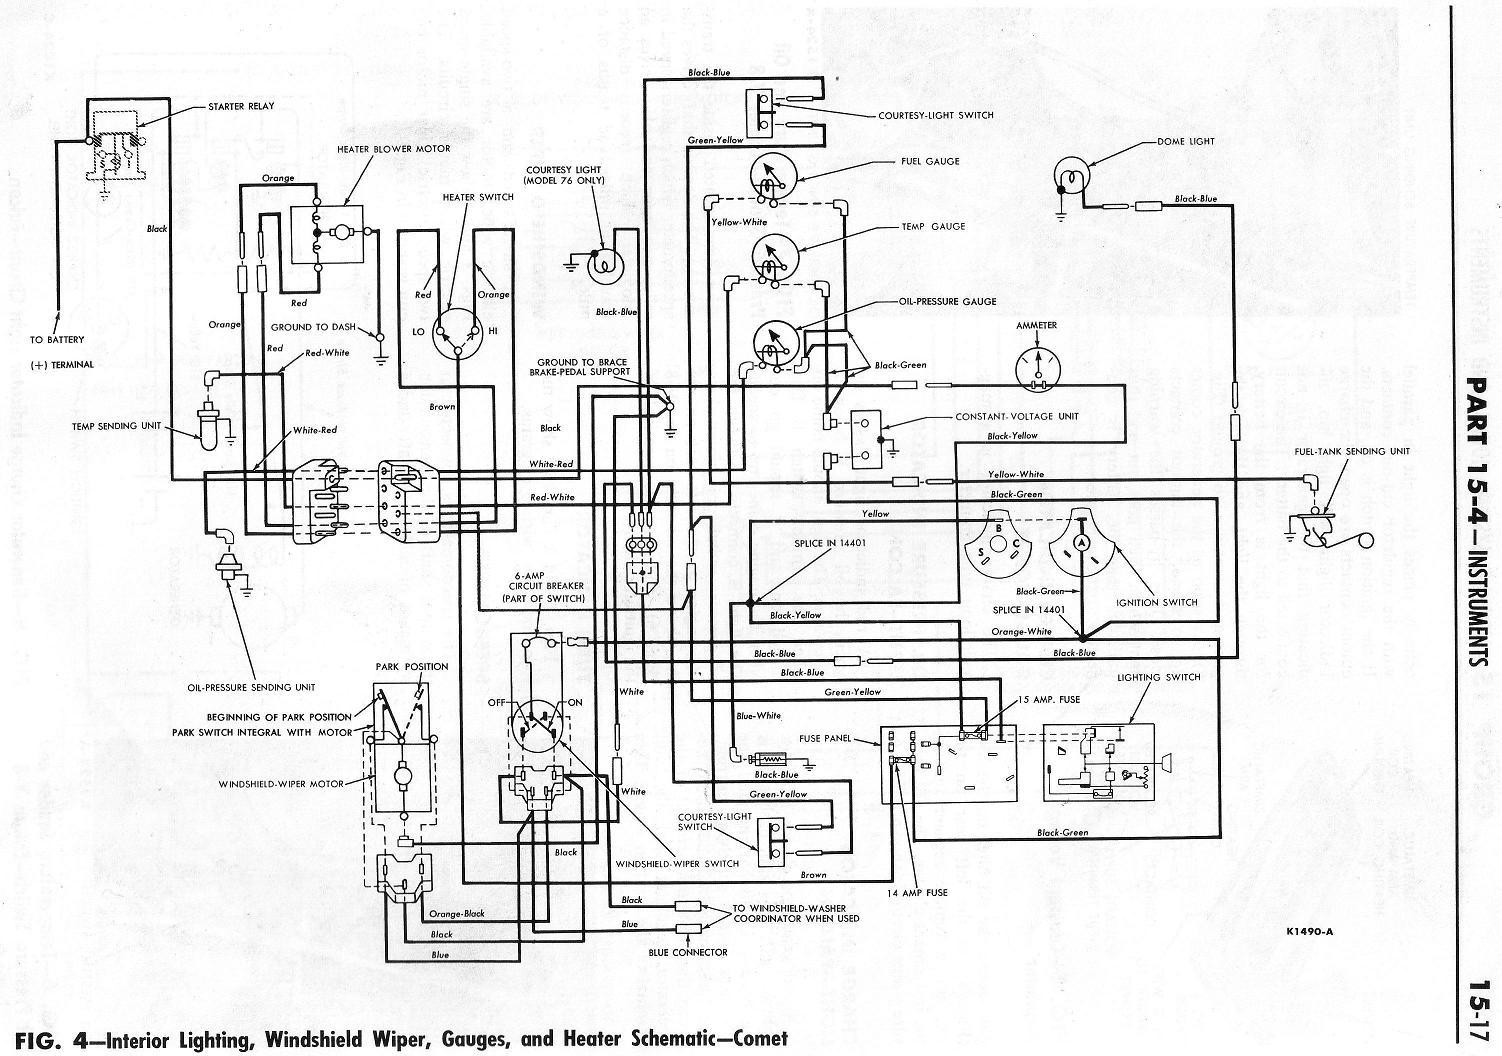 1966 Ford Galaxie 500 Wiring Diagram